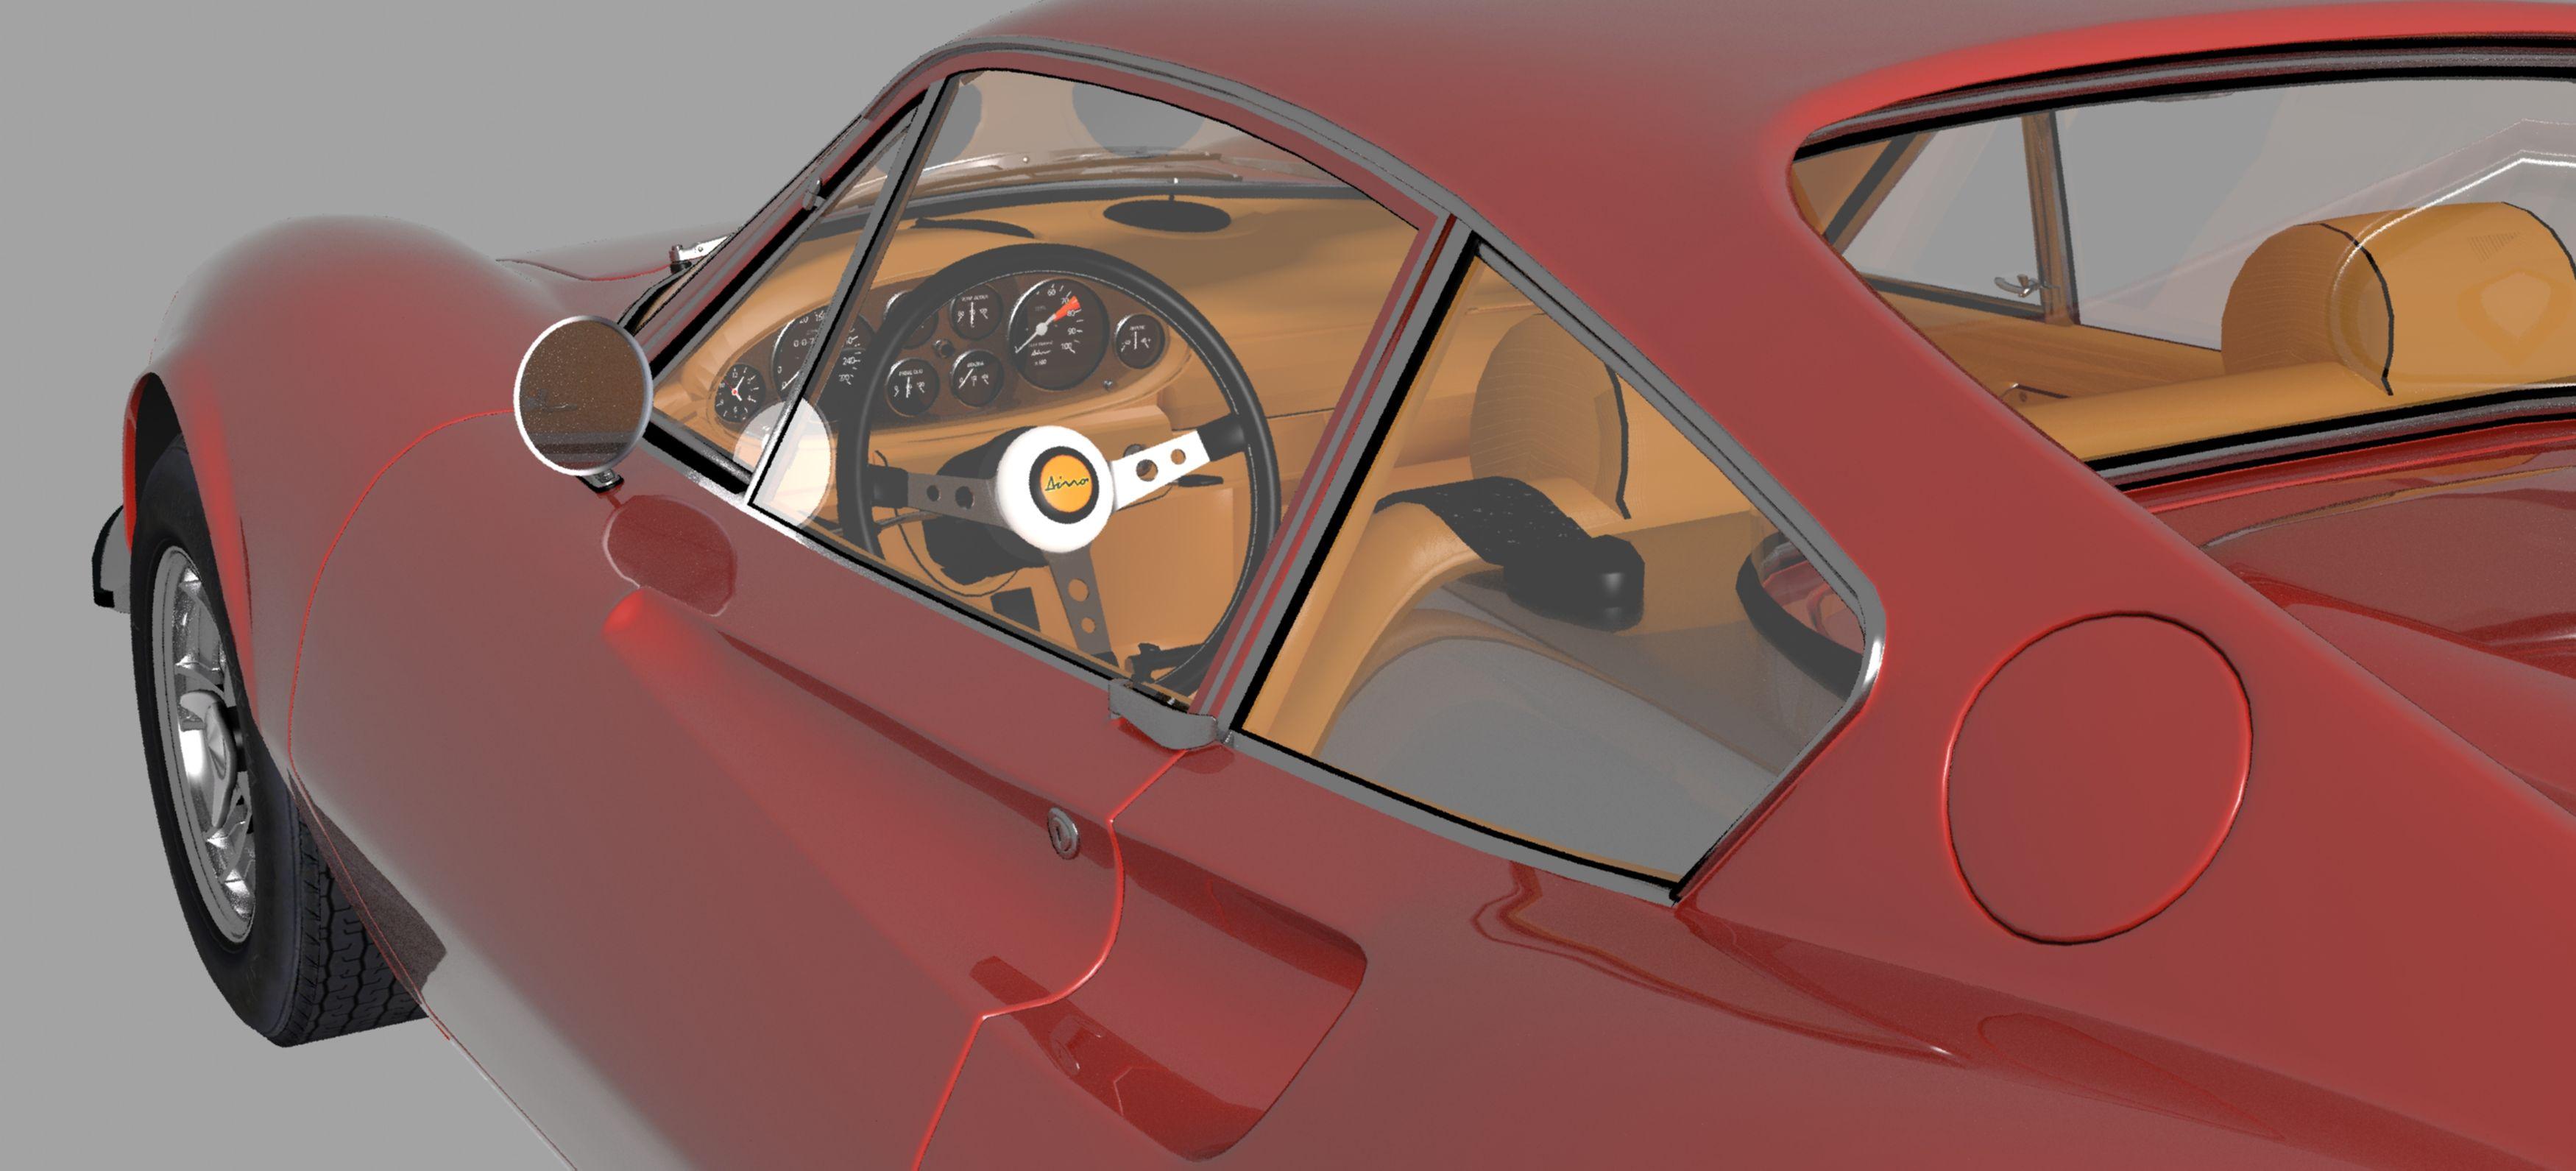 Ferrari-dino-246gt-3-3500-3500